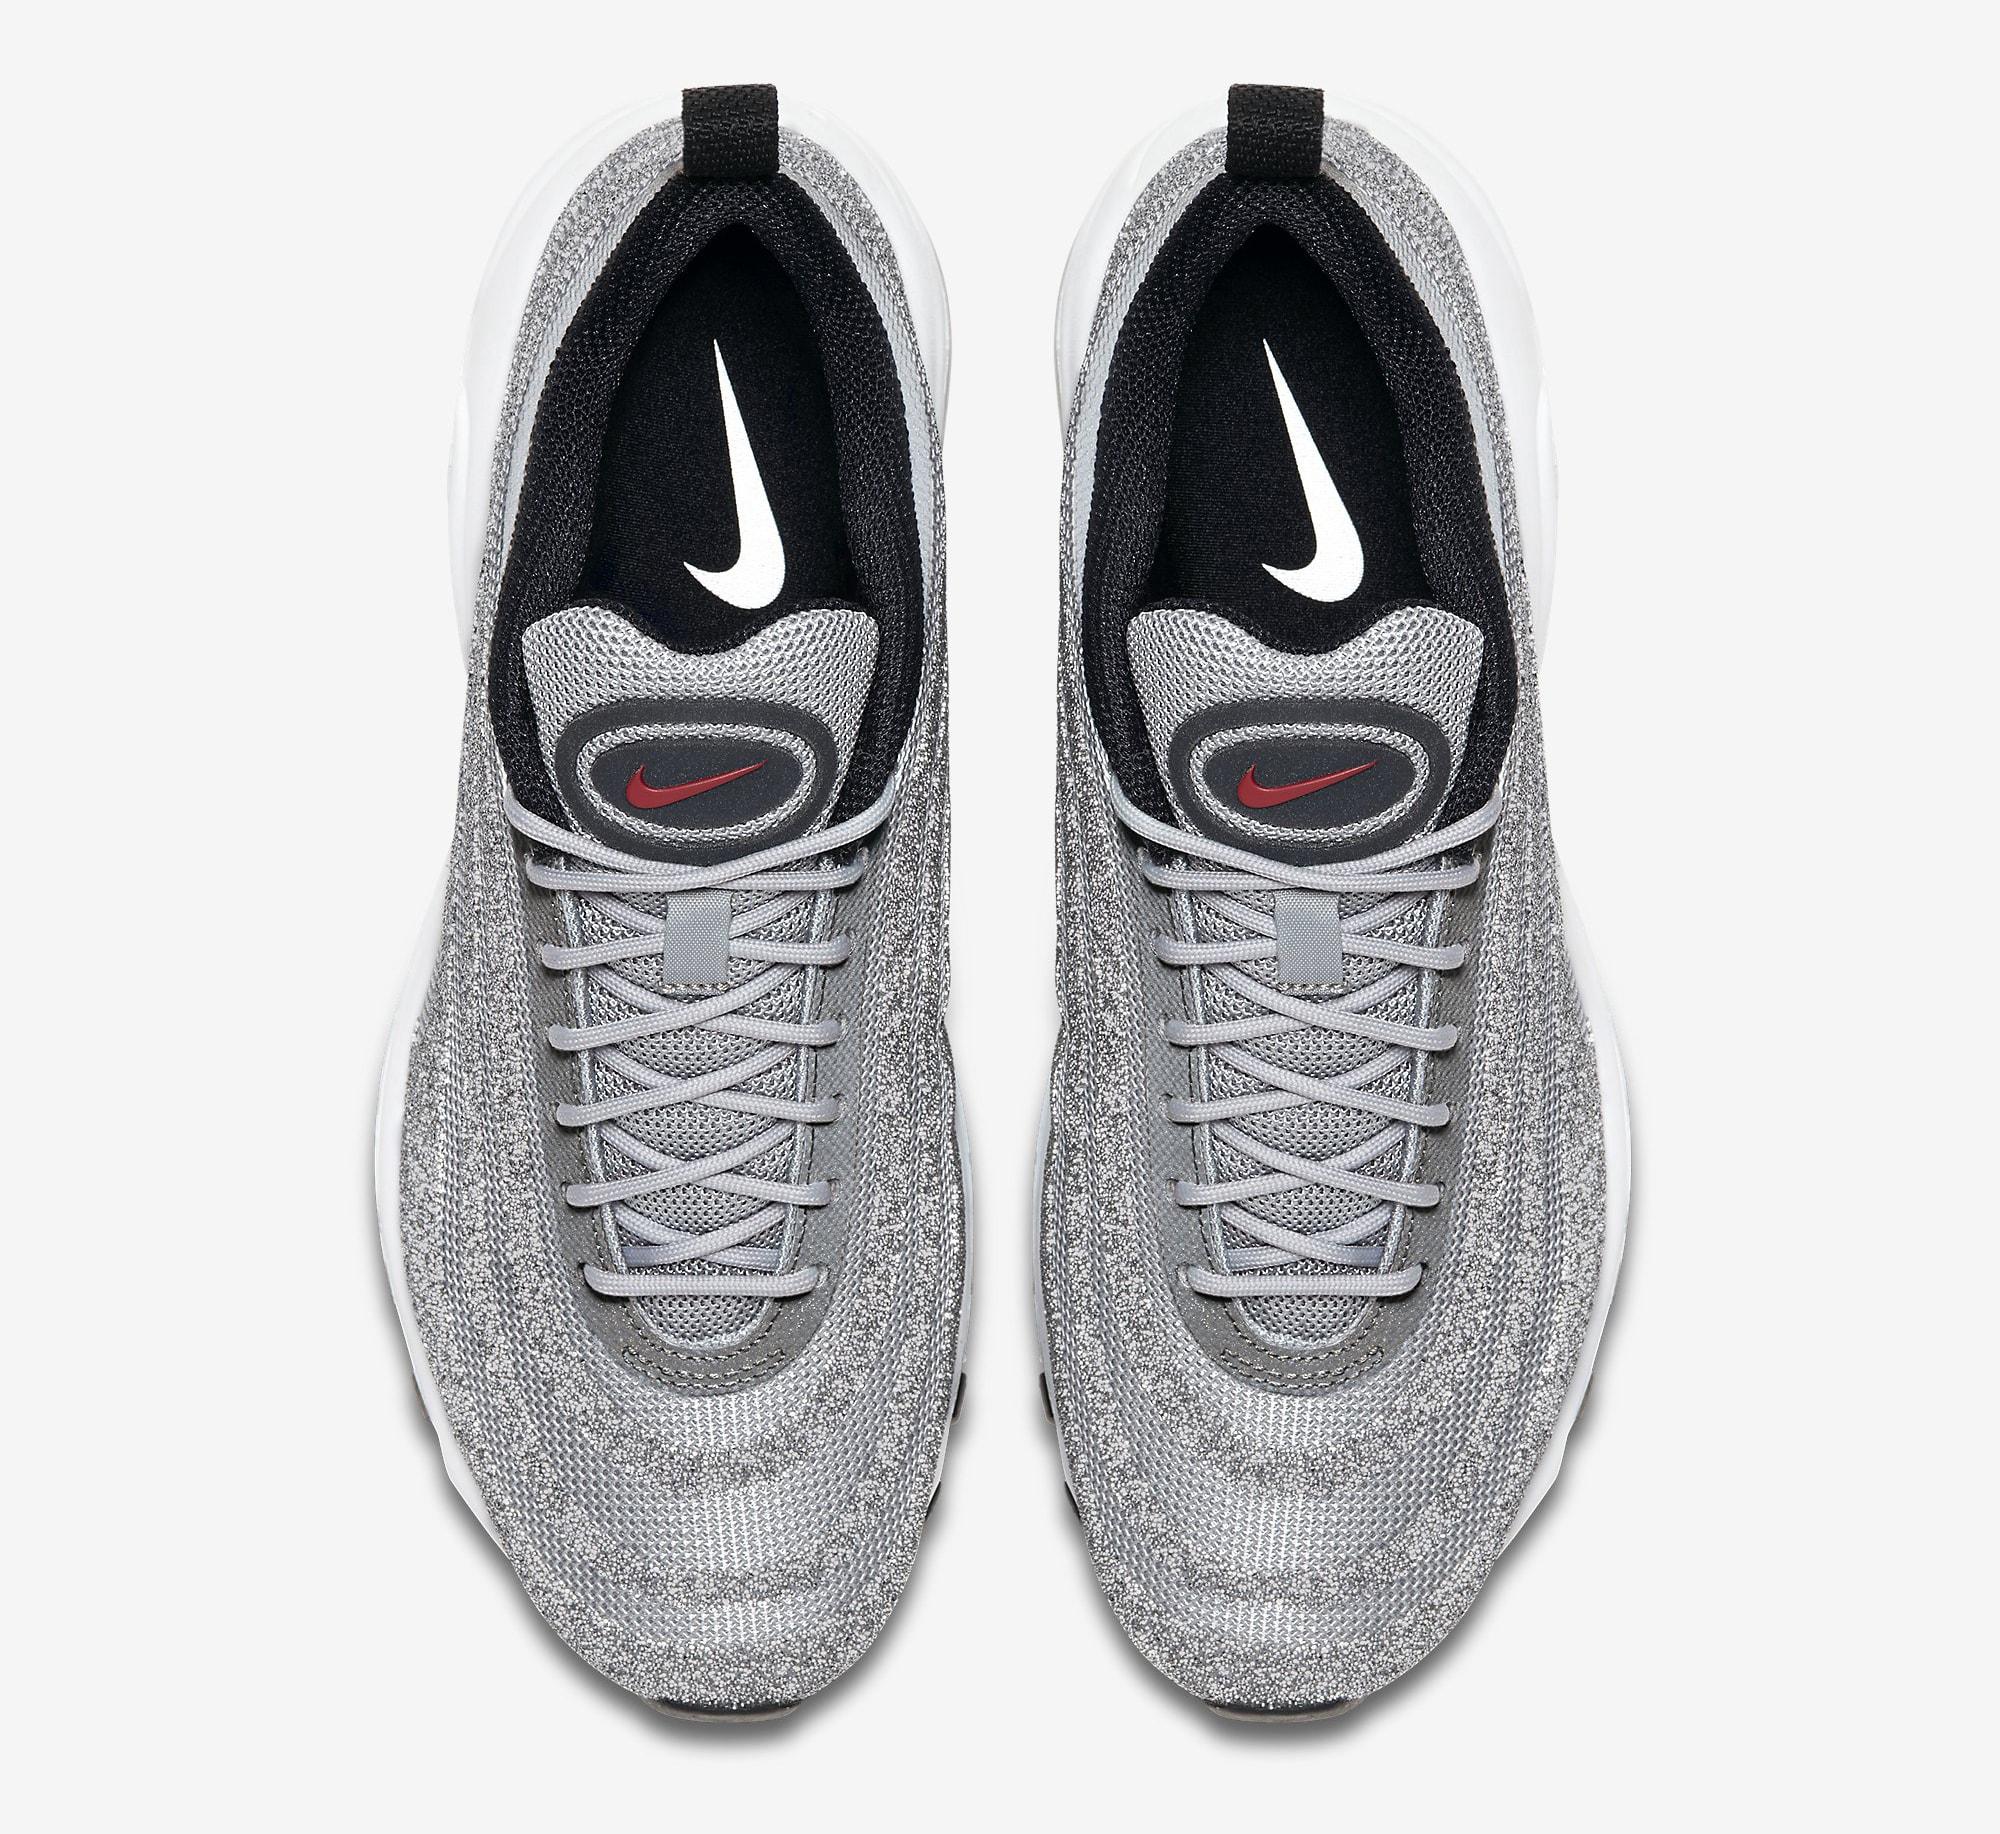 Crystal Nike Air Max 97 927508-002 Top